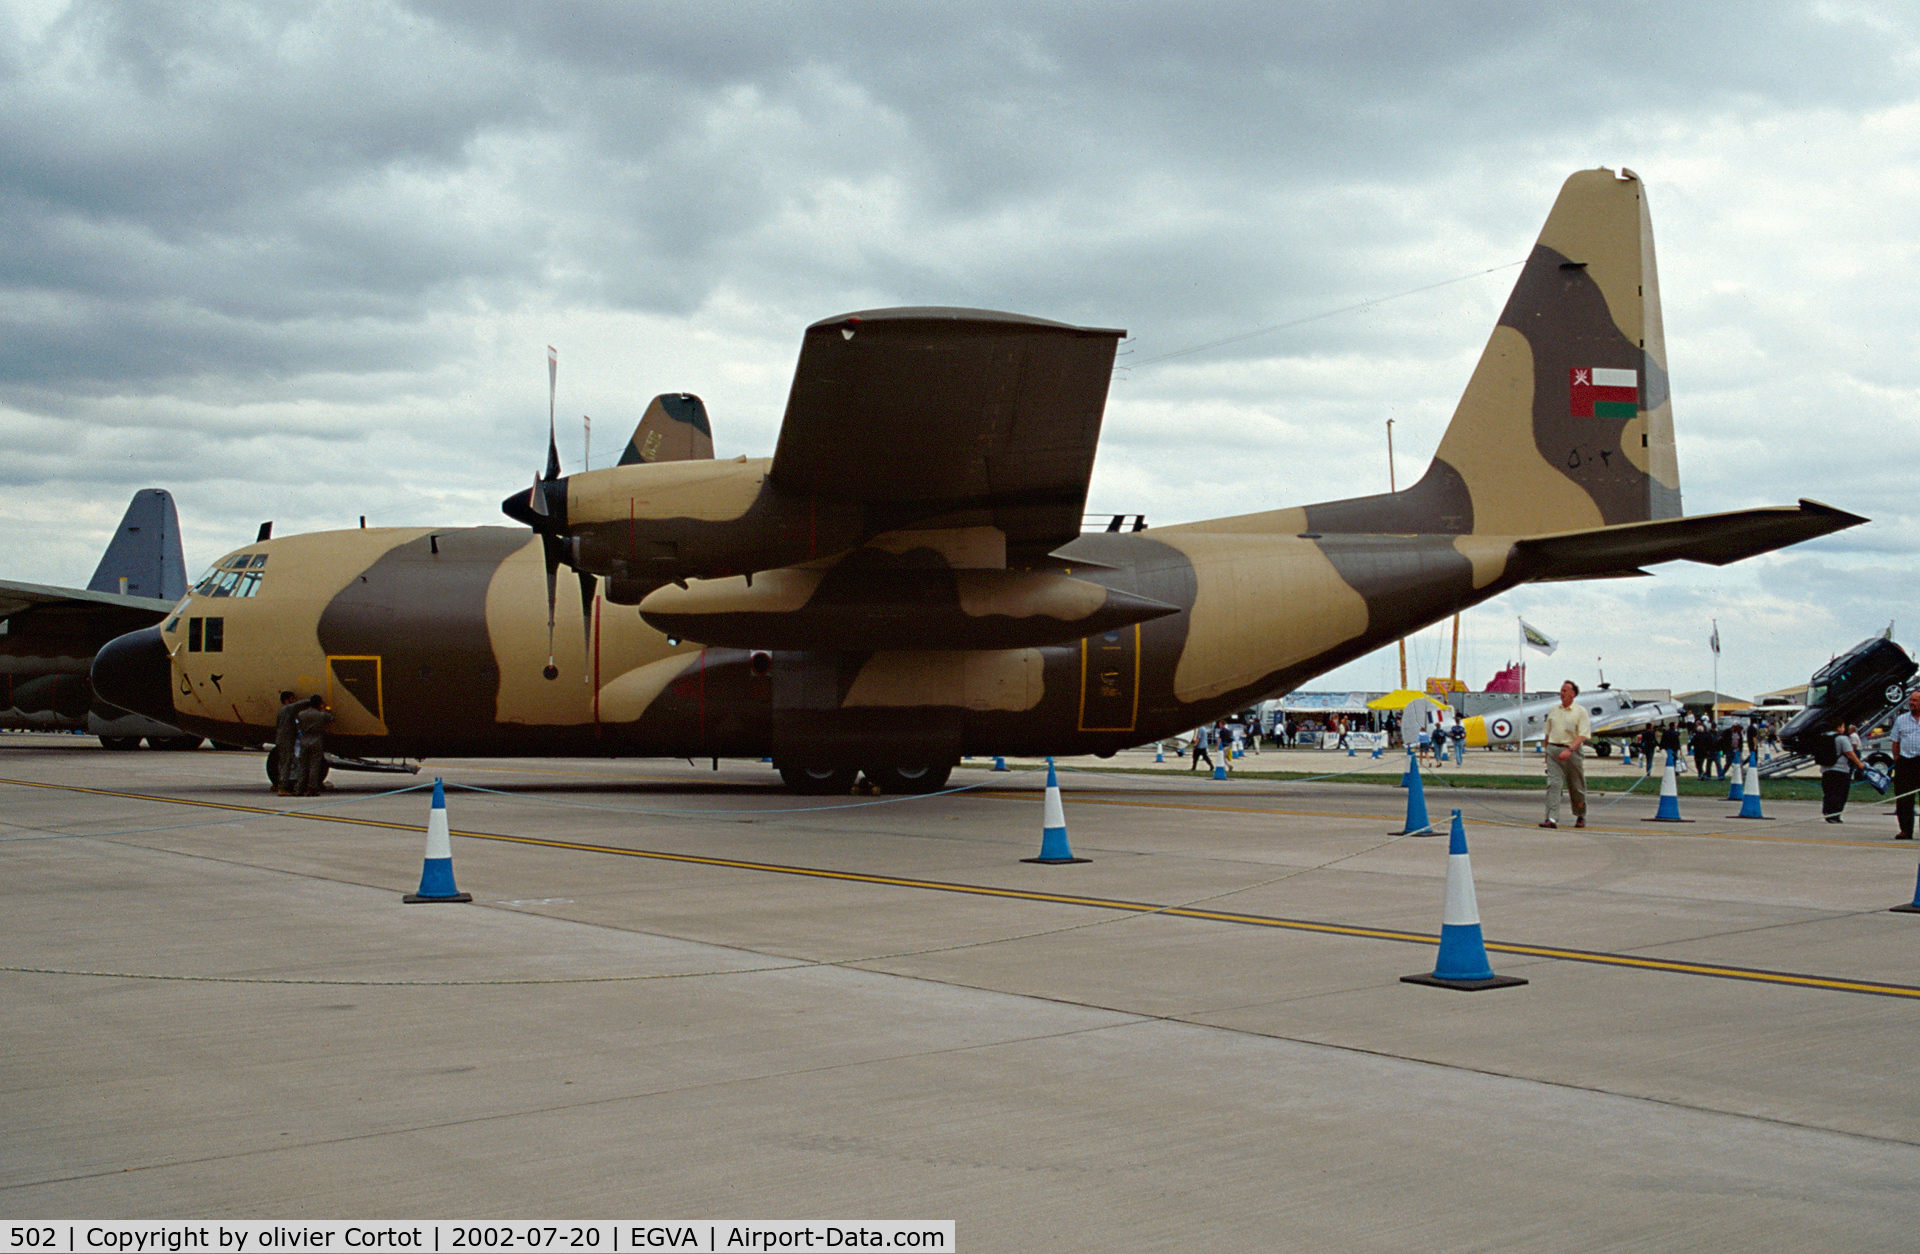 502, 1981 Lockheed C-130H Hercules C/N 4916, RIAT 2002